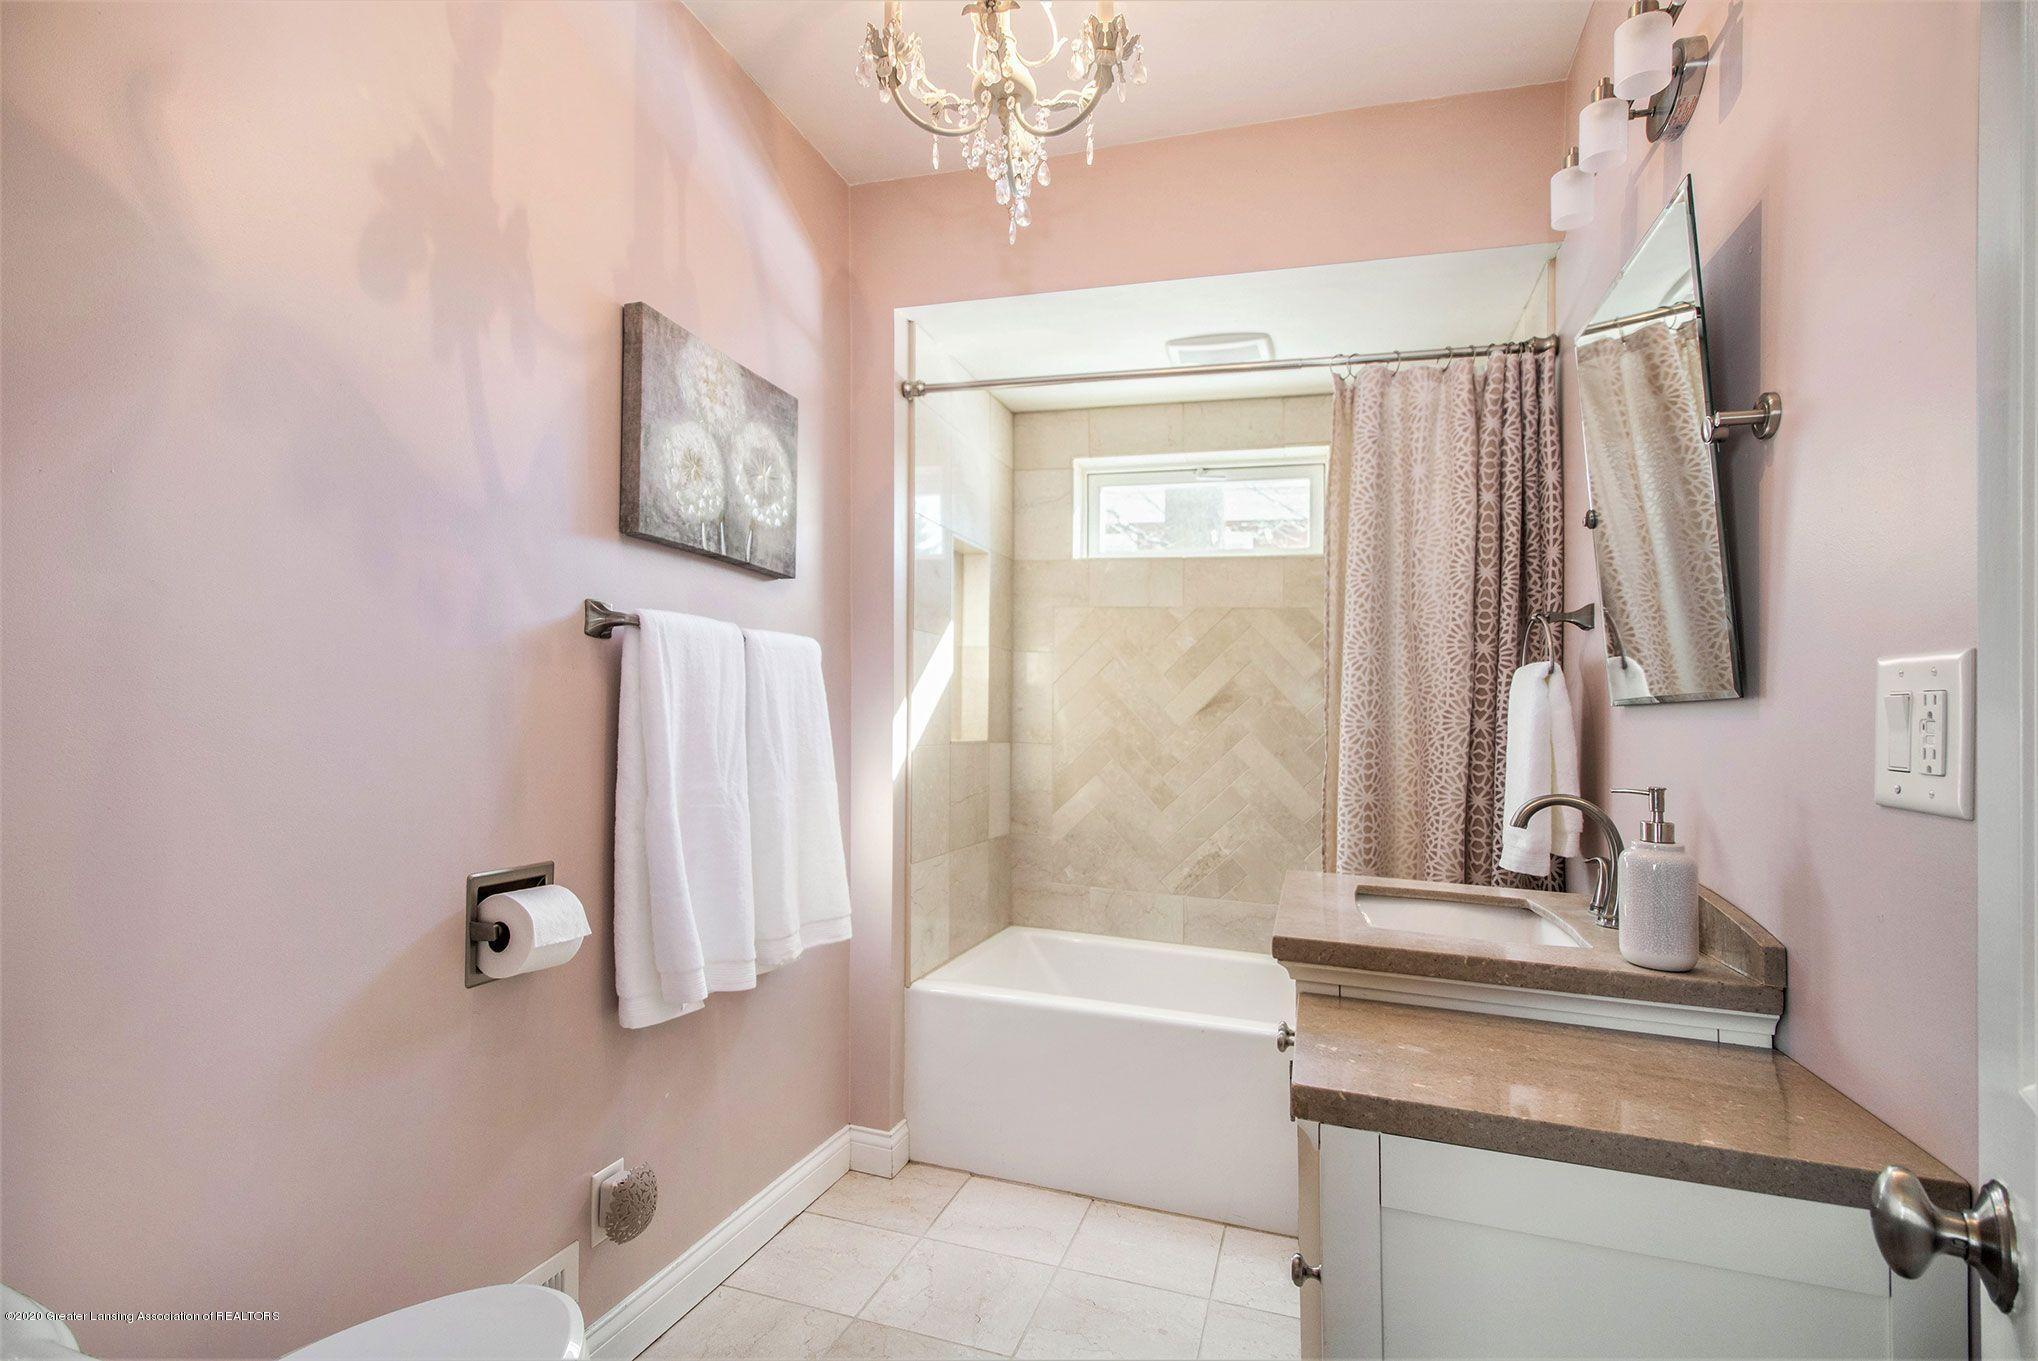 808 Water St - Full Bath - 17